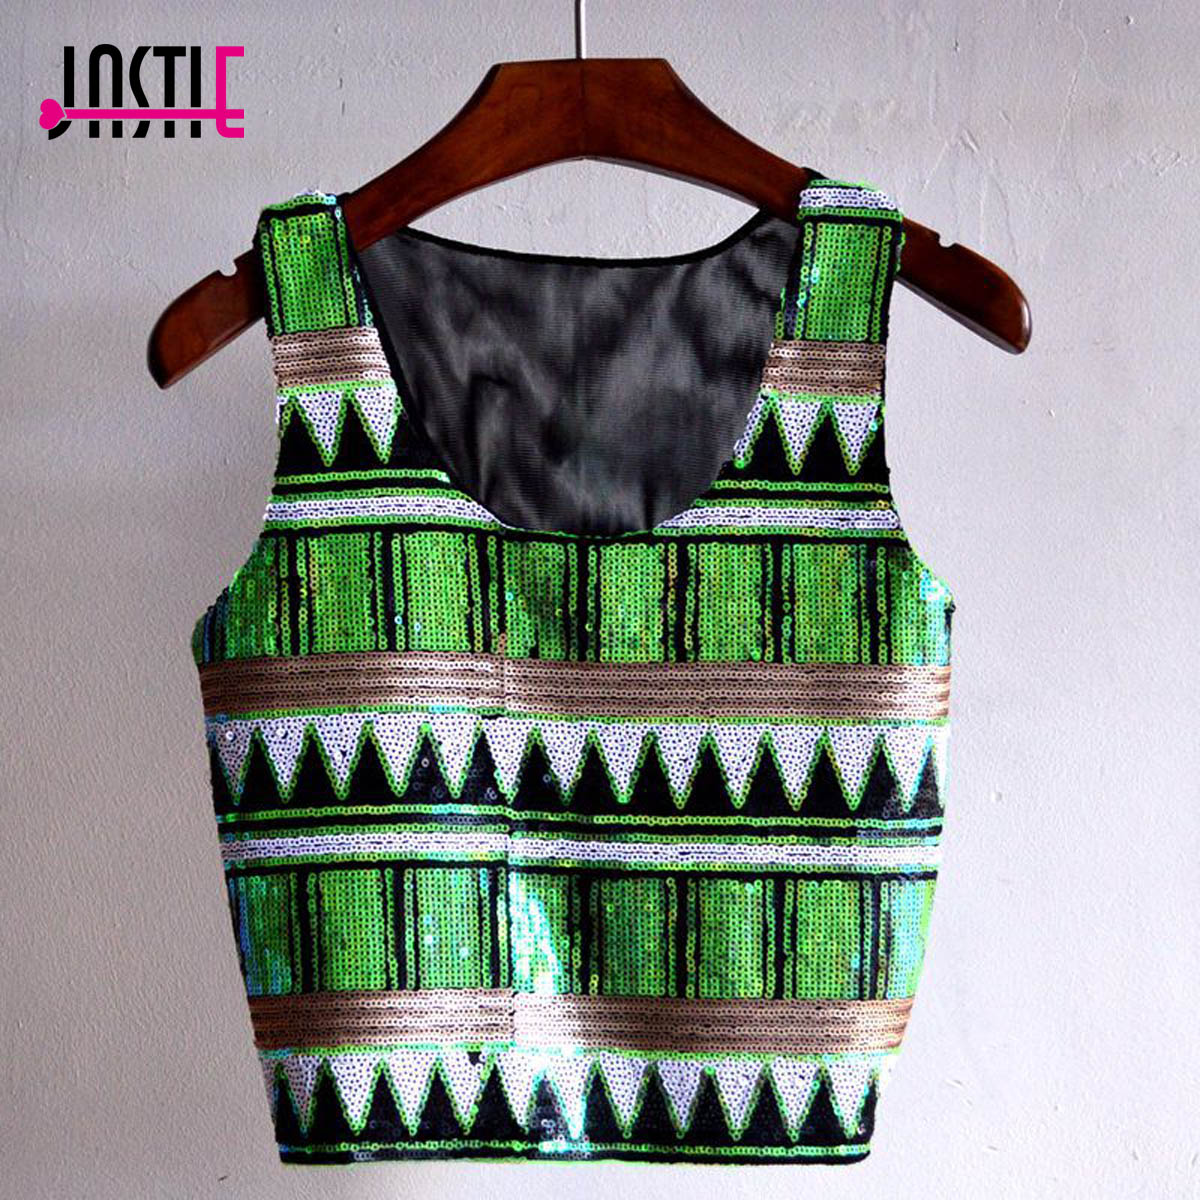 Jastie Party Club Sequins Women Tanks Top Boho Style Bling Tops Vest Mesh  Back Crop Top Shirt Beach Wear Camis Blusa Shirts b8b4d5fce6e3